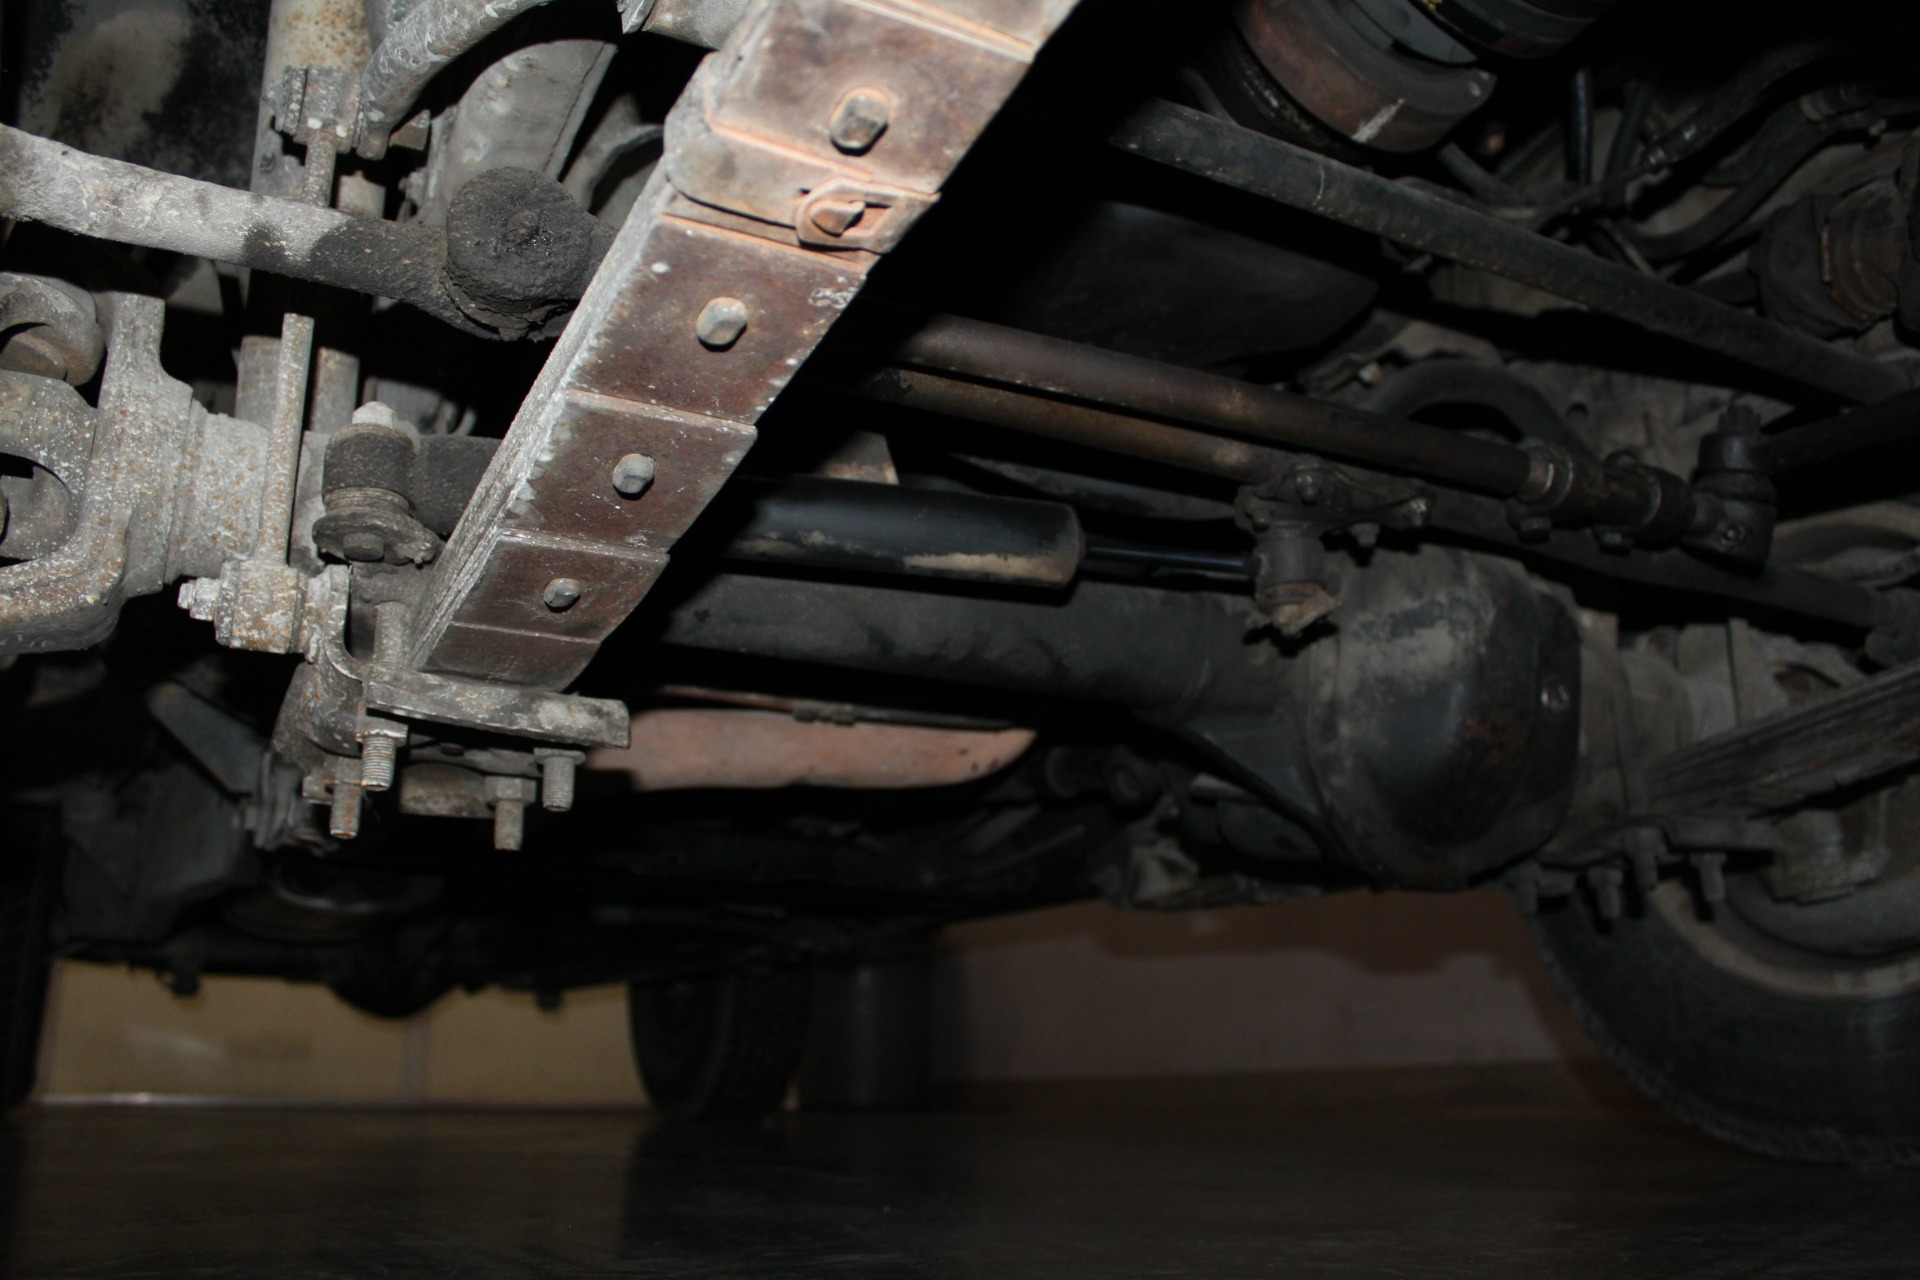 Used-1990-Jeep-Grand-Wagoneer-Chalenger